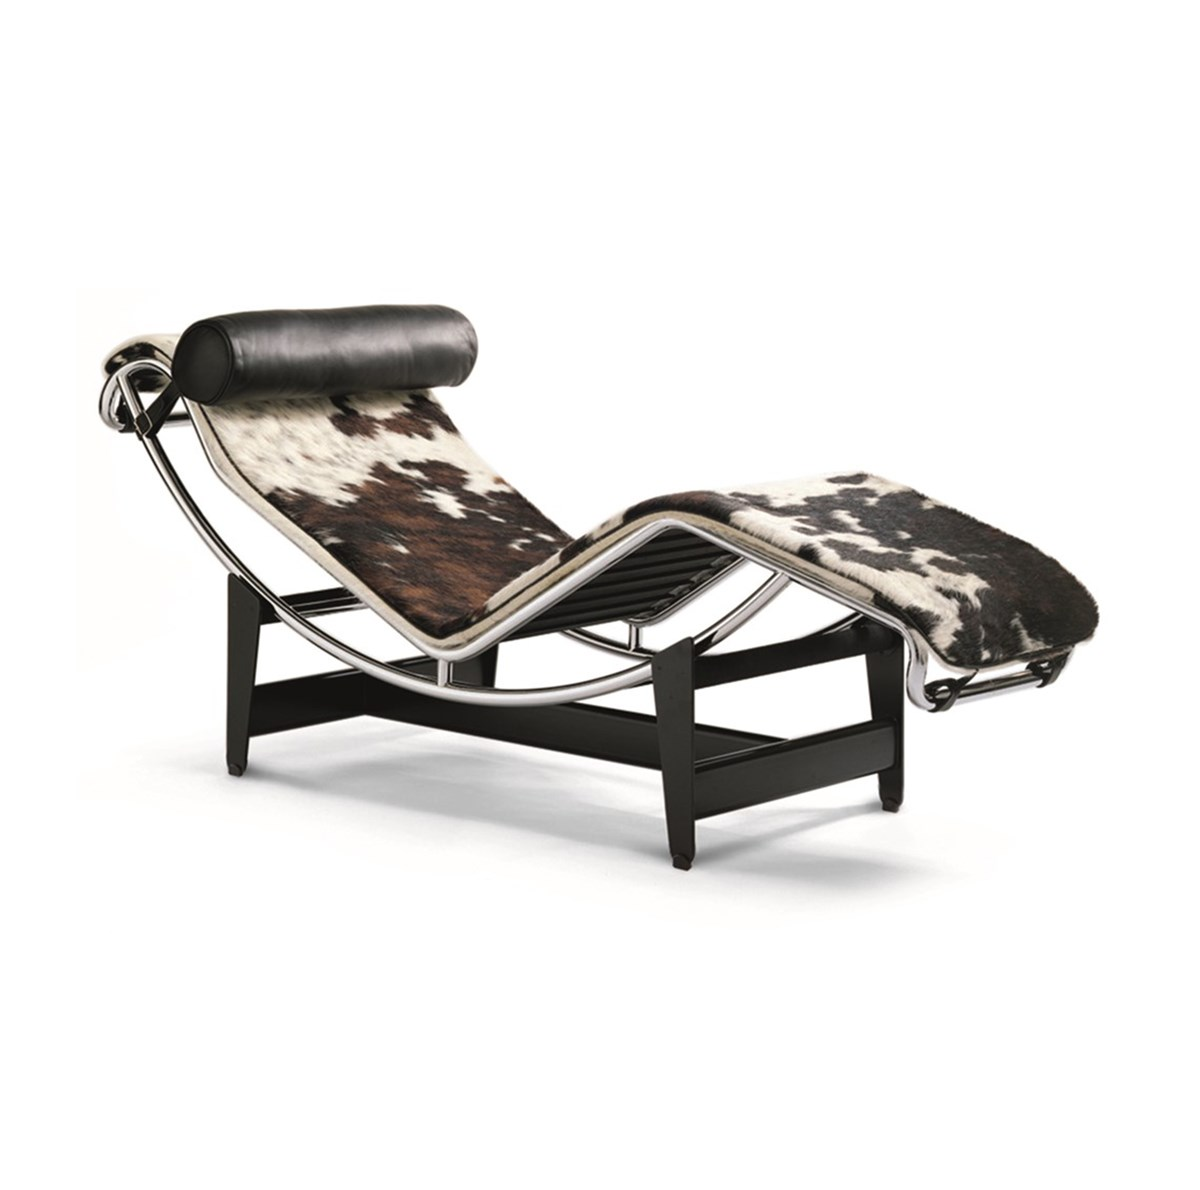 Cassina-Le-Corbusier-Pierre-Jeanneret-Charlotte-Perriand-LC4-Chaise-Longue-Matisse-1